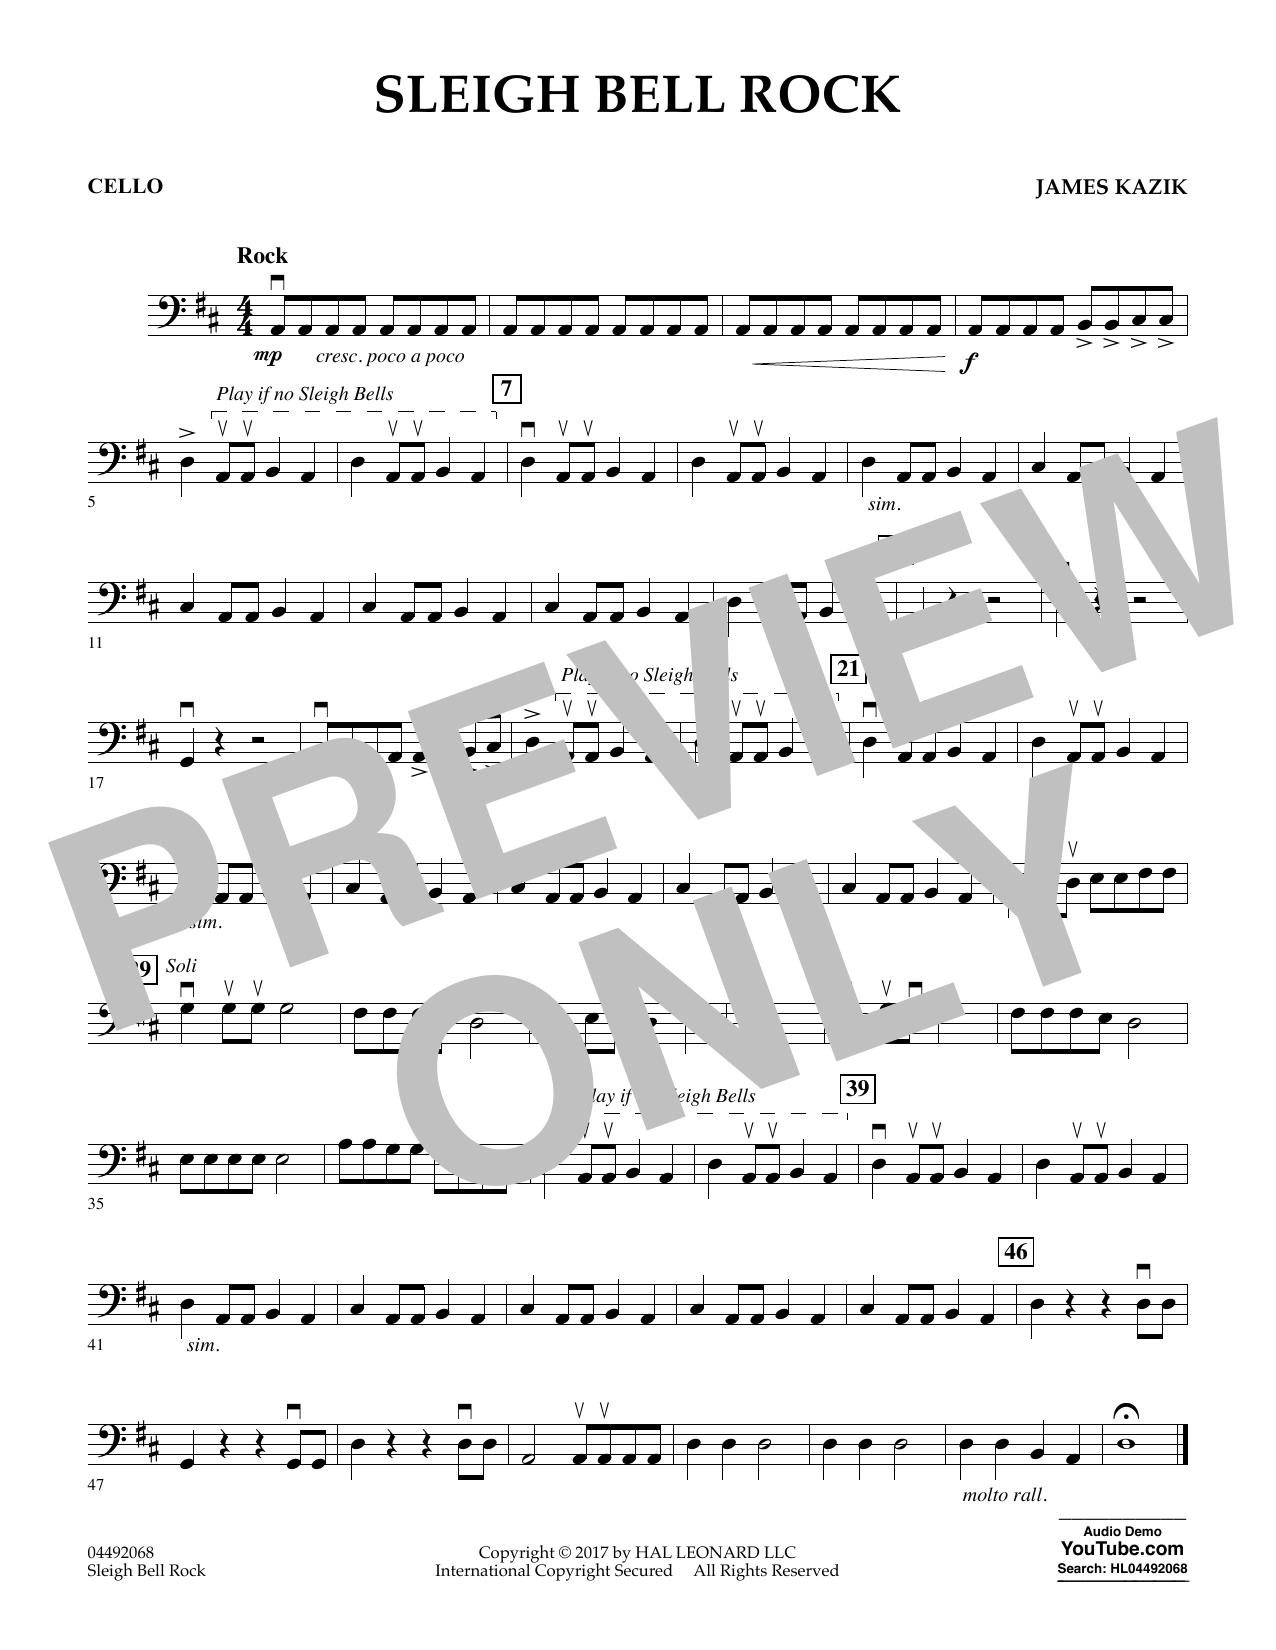 James Kazik Sleigh Bell Rock - Cello sheet music notes and chords. Download Printable PDF.